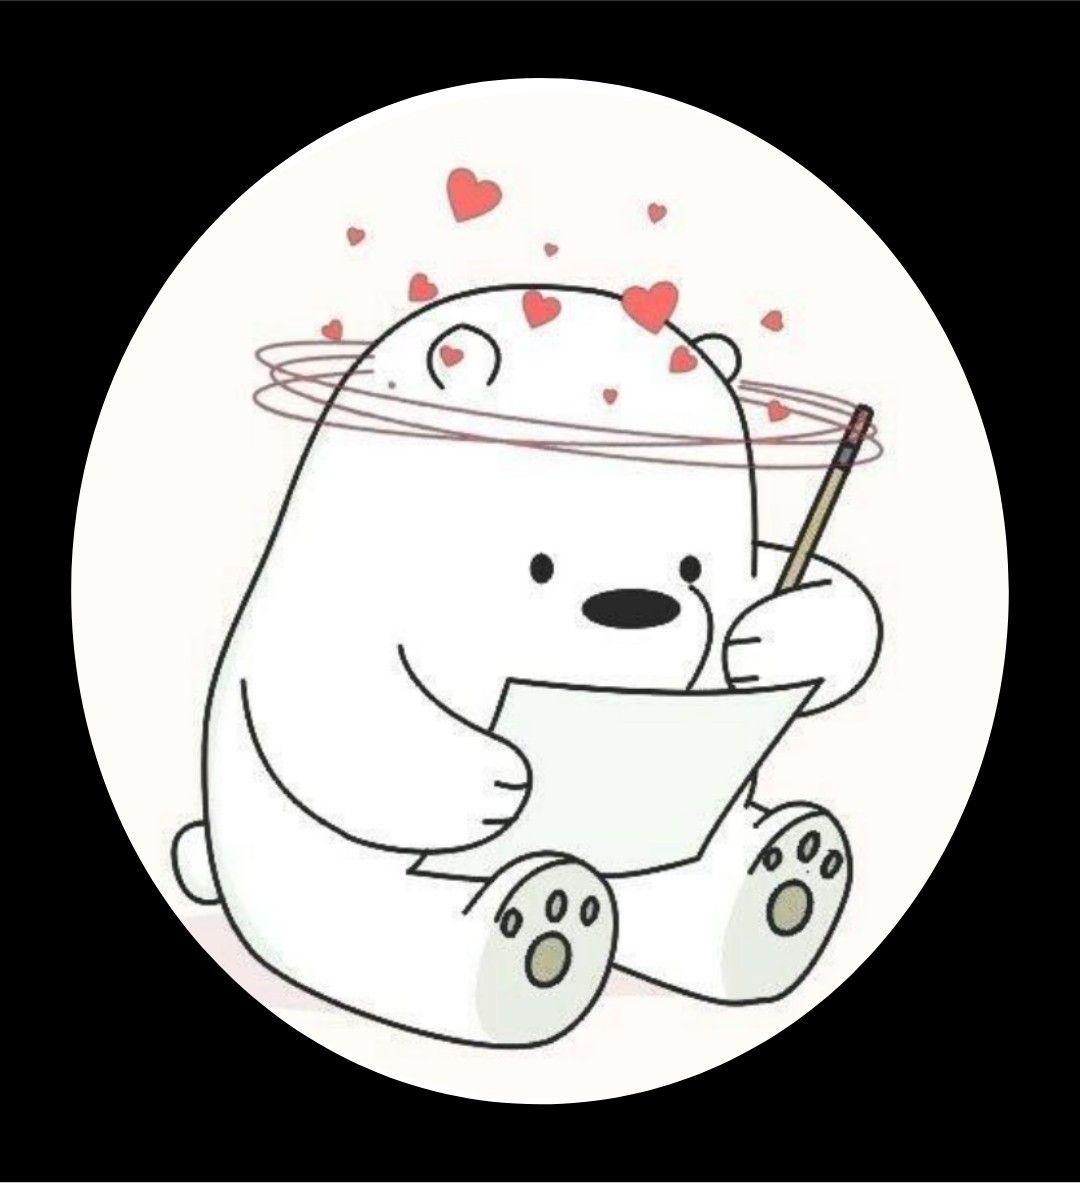 افتار كيوت الدببة الثلاثة In 2021 Fictional Characters Character Art